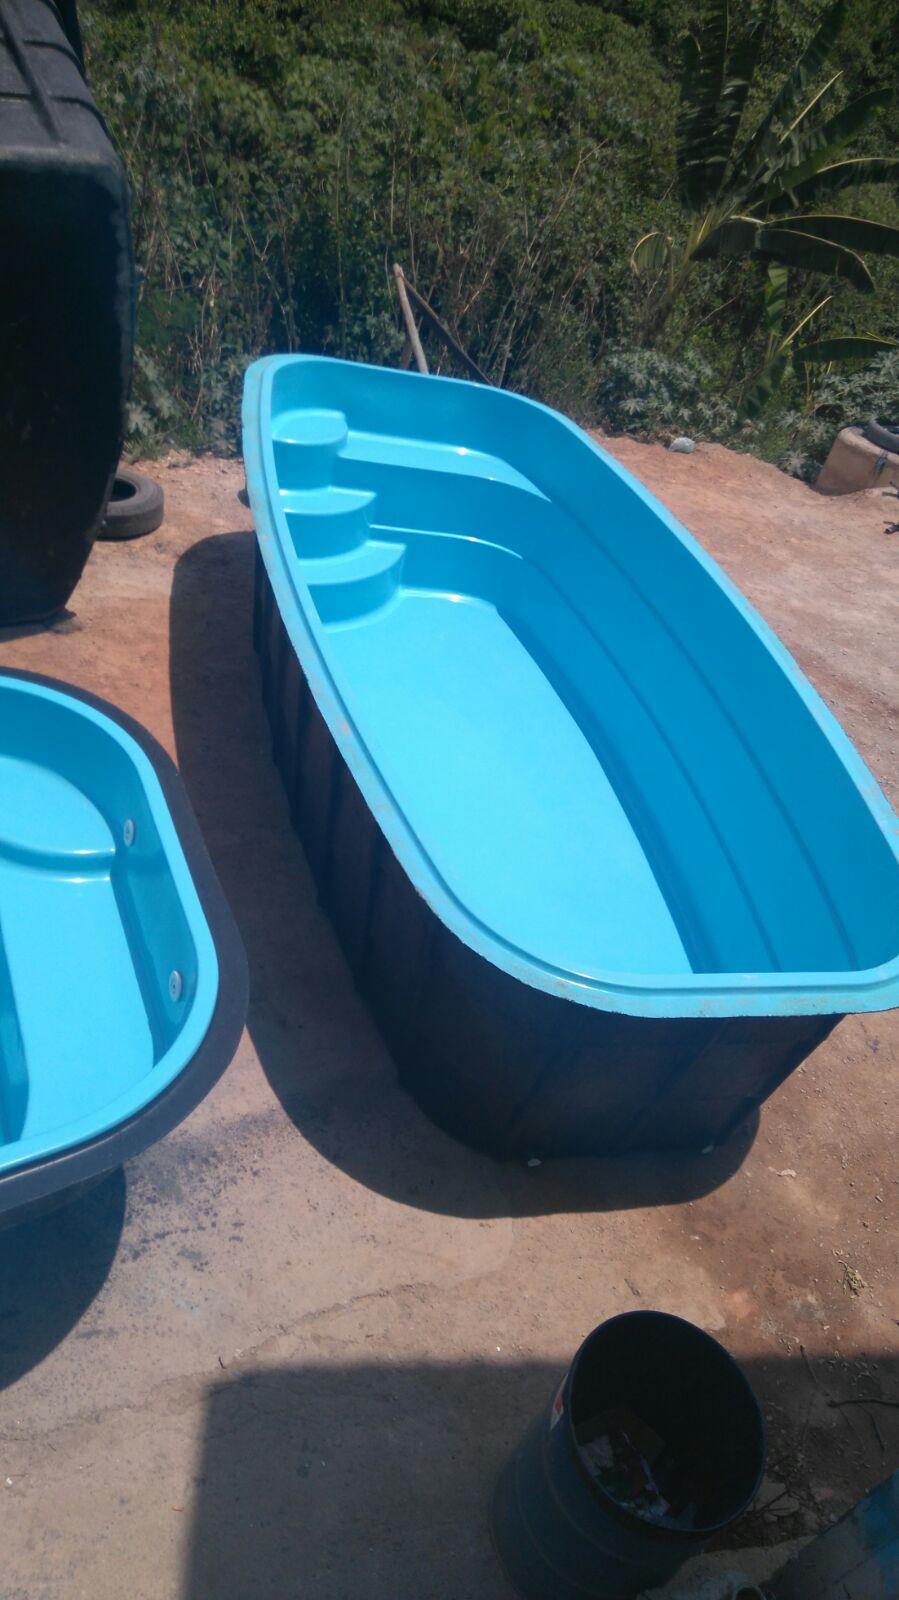 757add42732f6 piscina de fibra bh